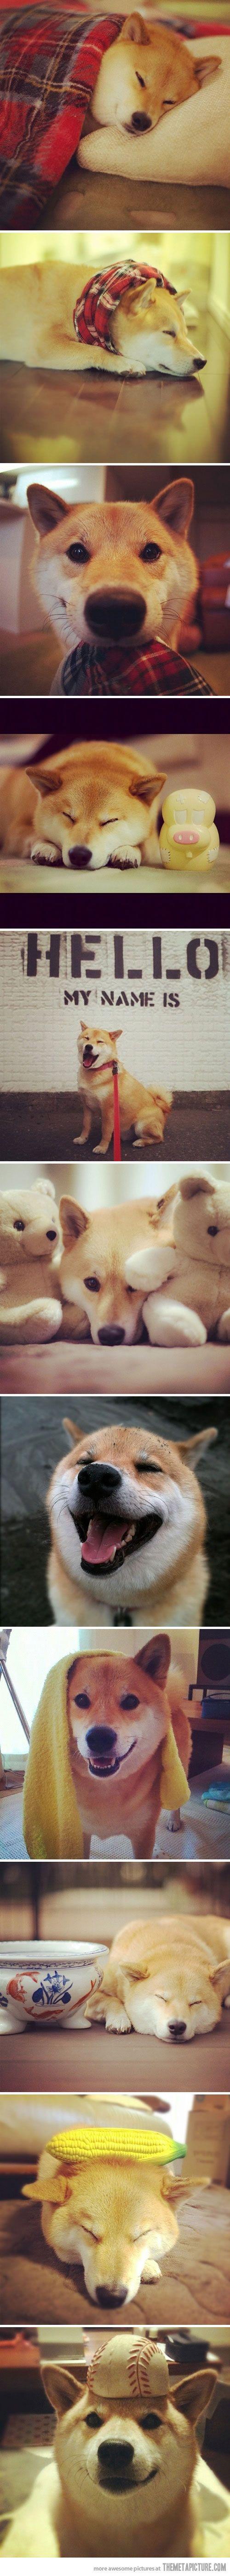 Alles Für Kleine Hunde - Alles Für Kleine Hunde